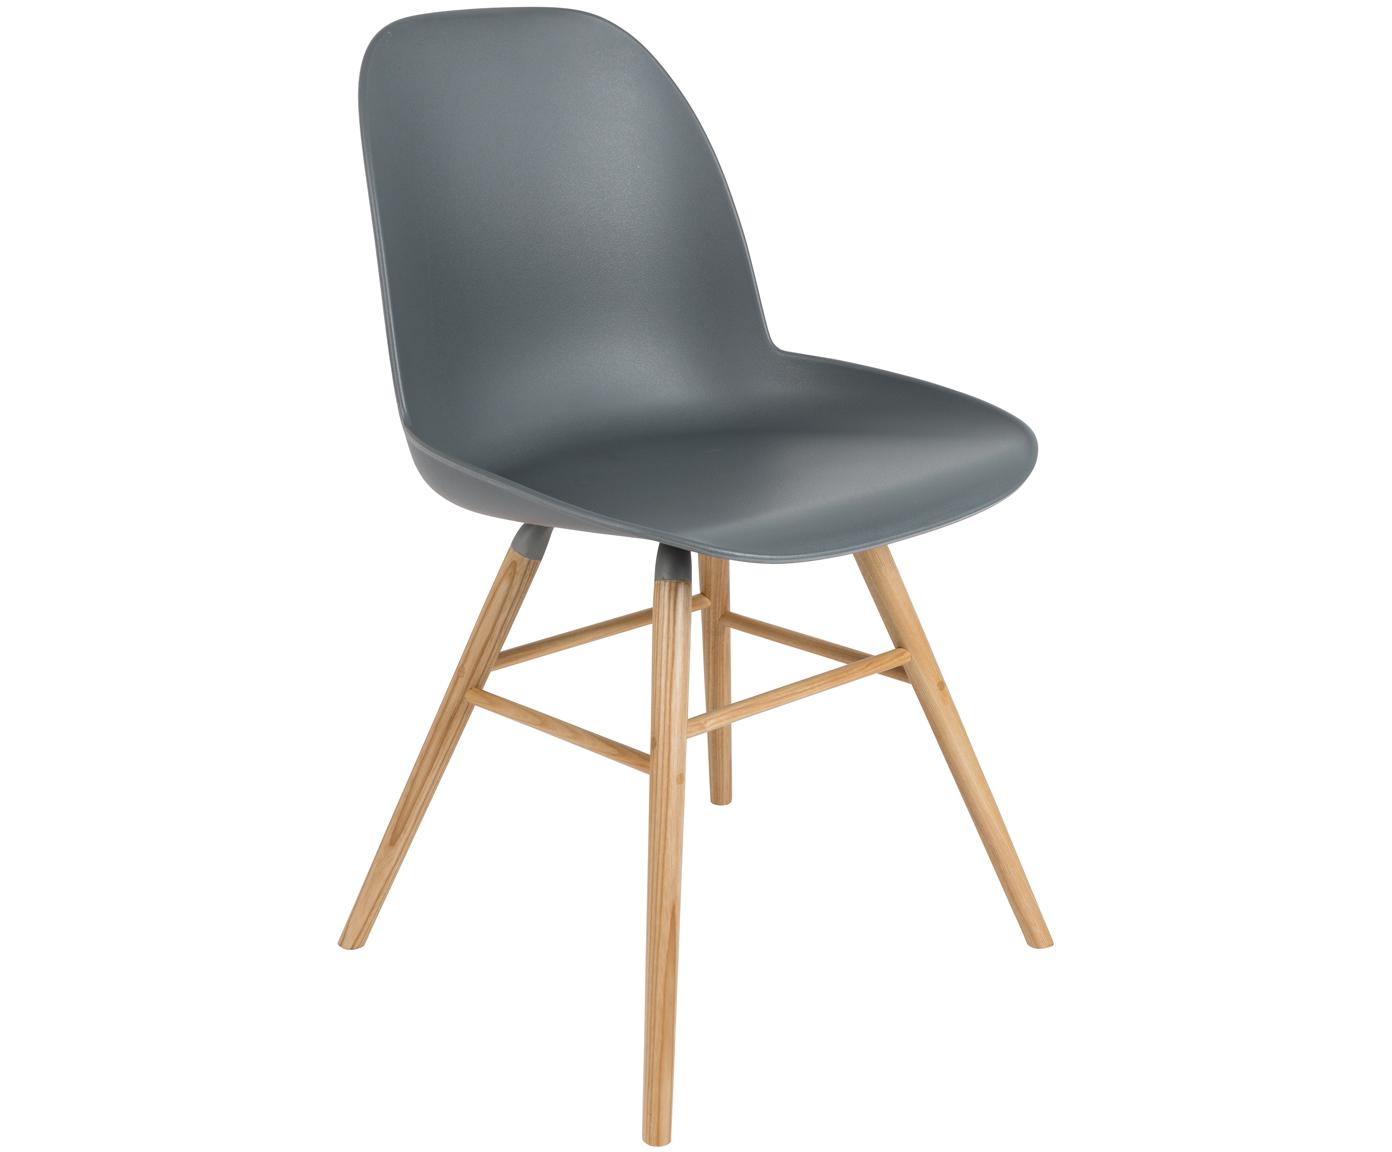 Sedia Albert Kuip, Seduta: 100% polipropilene, Piedini: legno di frassino, Grigio-blu, Larg. 49 x Prof. 55 cm